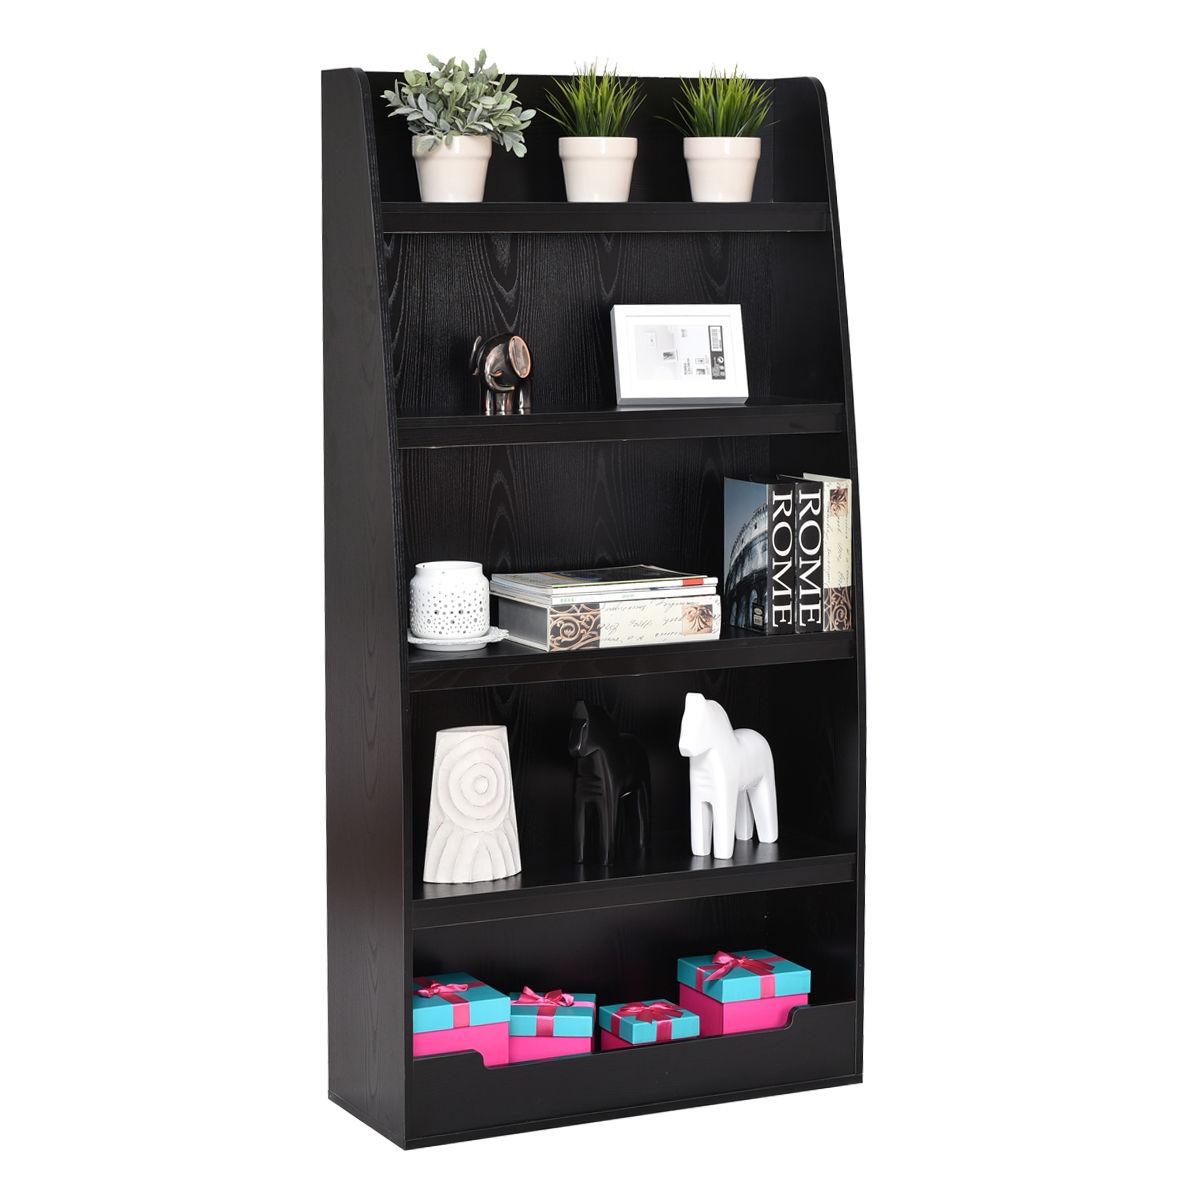 Giantex 5 Layers Bookcases Modern Living Room Bookshelf Storage Display Shelves Wooden Home Office Furniture HW55011 horse display bookshelf wooden furniture